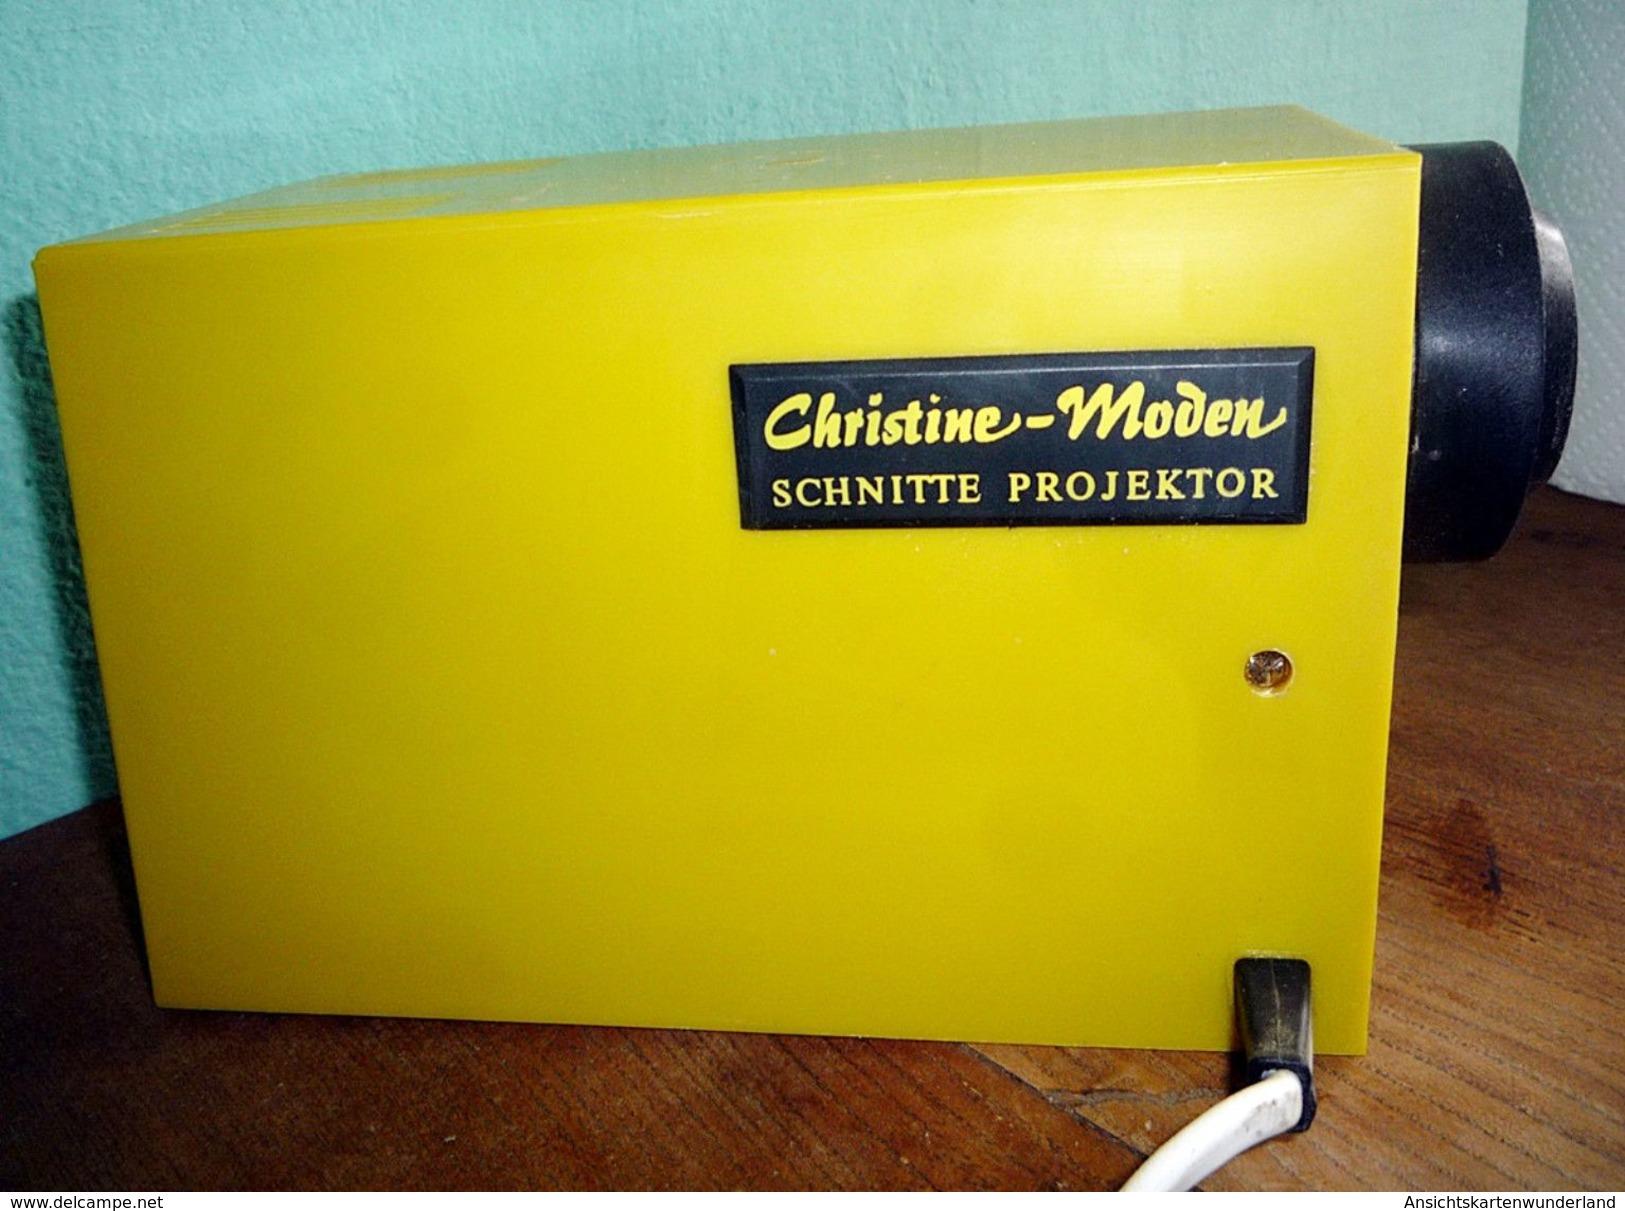 Schnittmuster Projektor Christine Moden 70er Jahre - Projecteurs